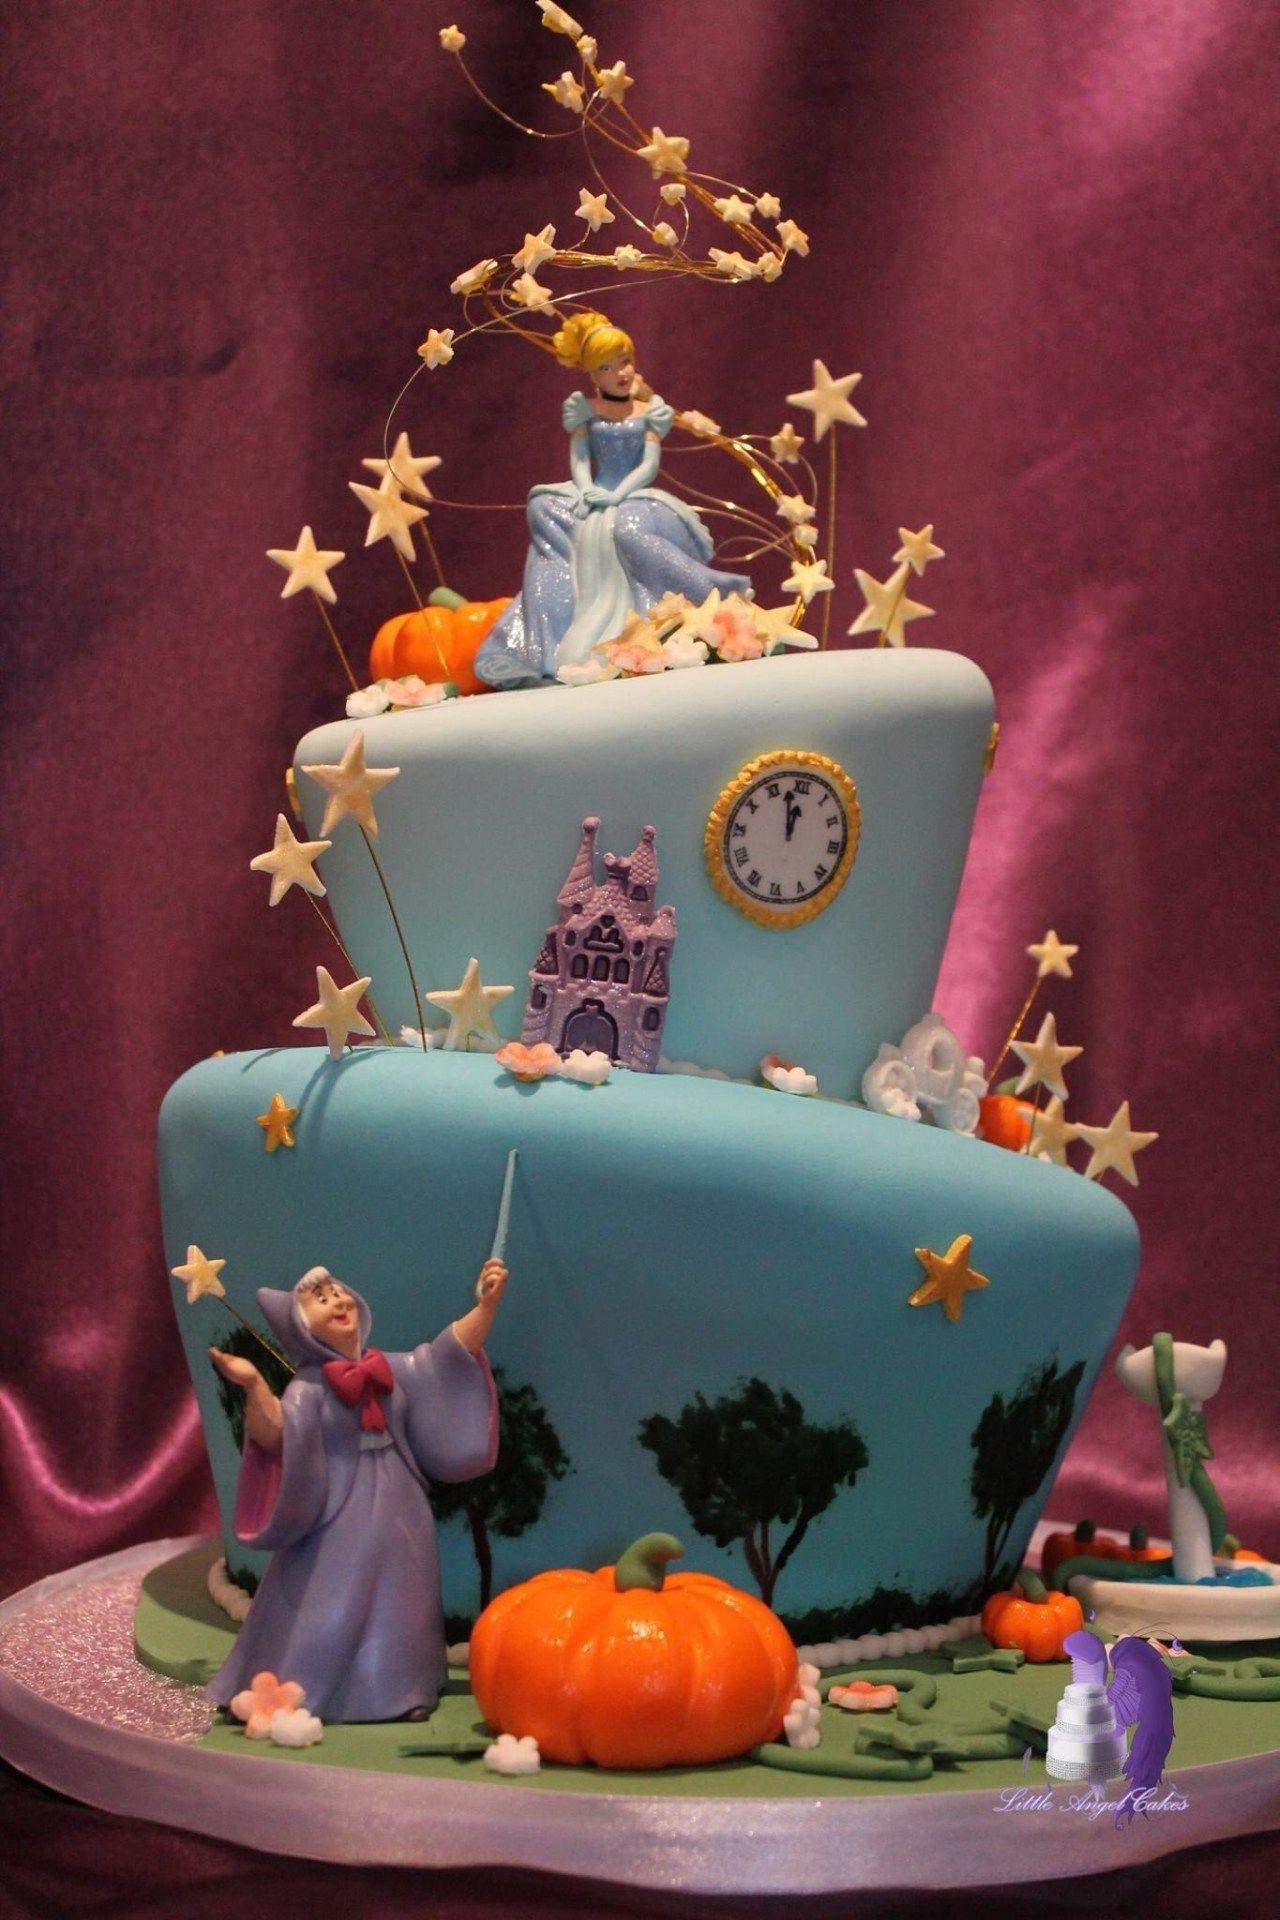 Strange Cinderella Birthday Cake Cinderella Cake Birthday Cake Pinterest Funny Birthday Cards Online Barepcheapnameinfo